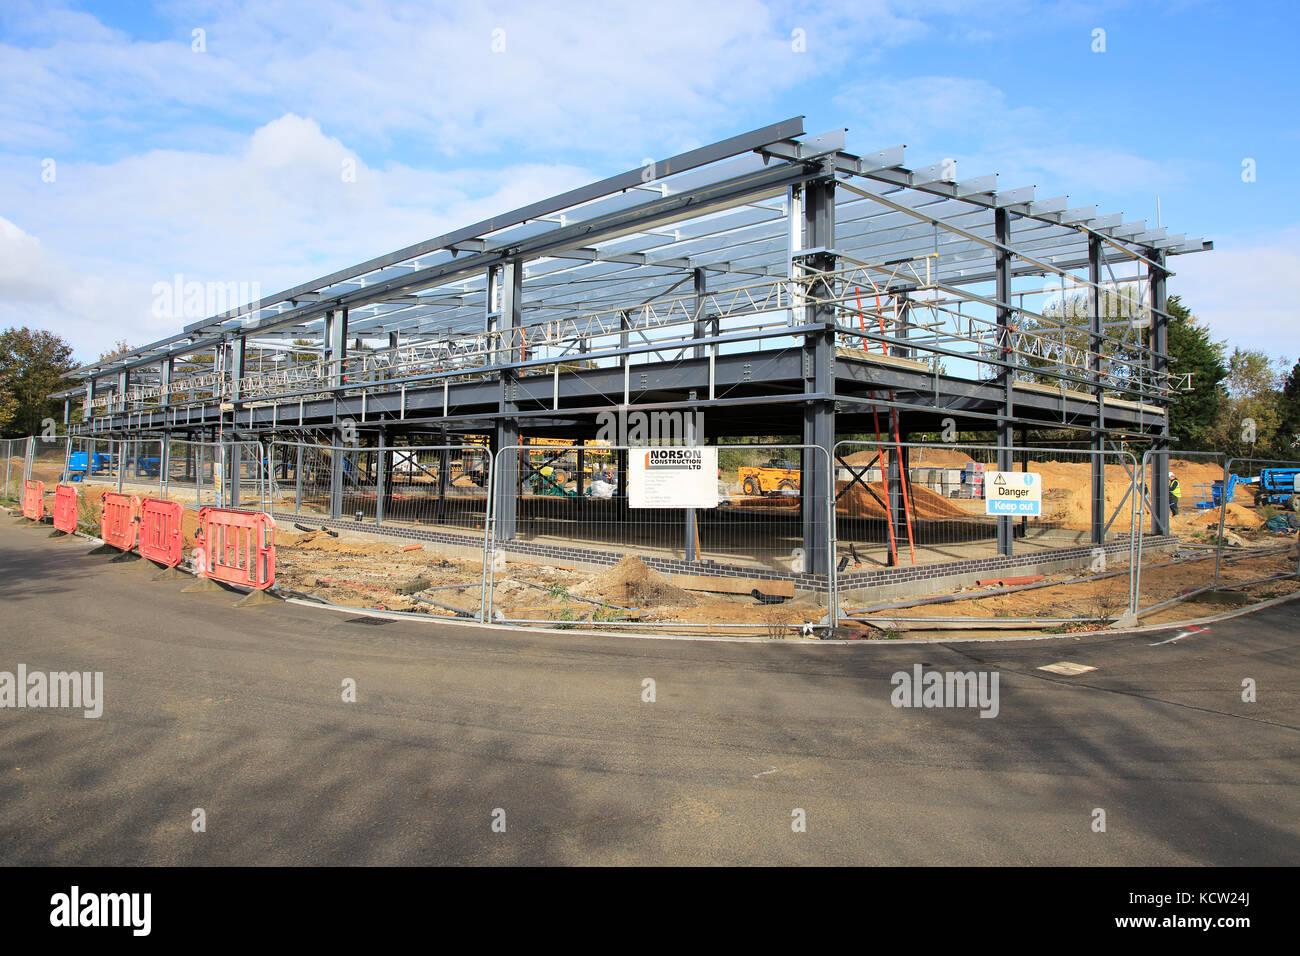 New industrial units under construction at Riduna Park, Melton, Suffolk, England, UK Stock Photo